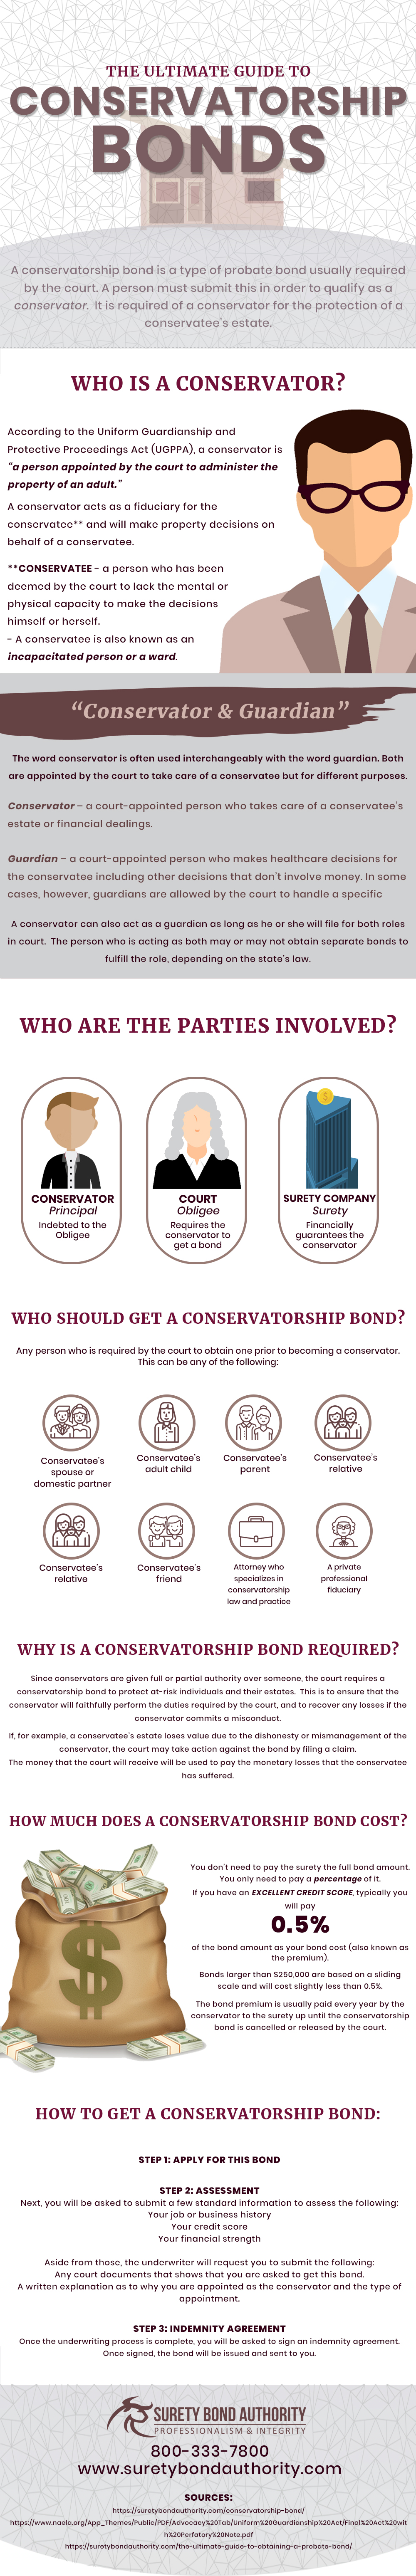 Conservator Bonds Infographic